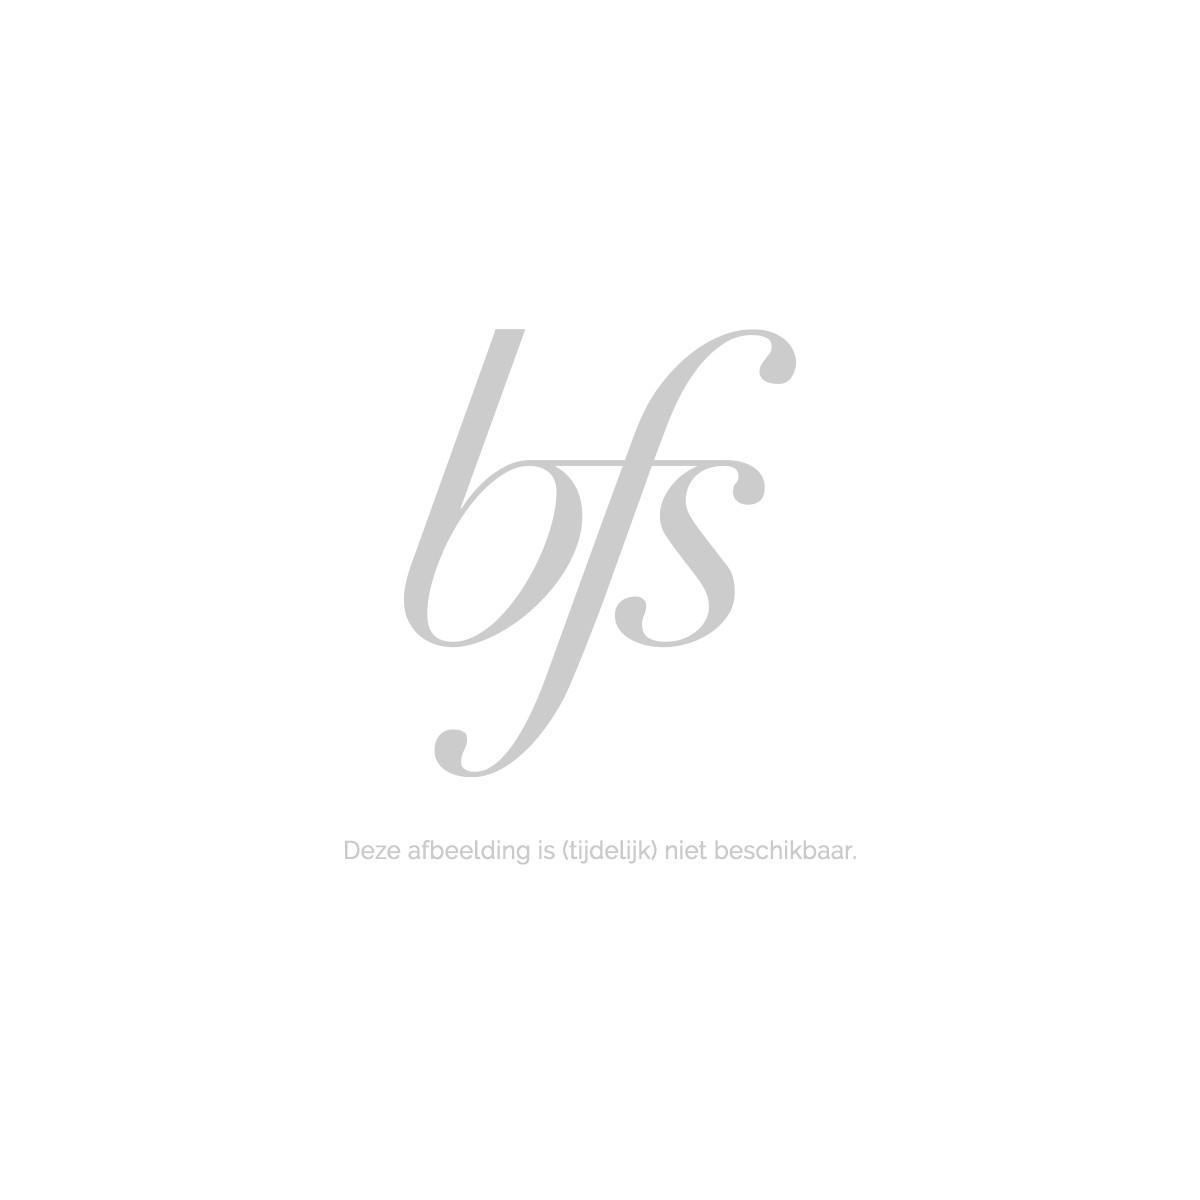 Barburys Baard Conditioner 150Ml